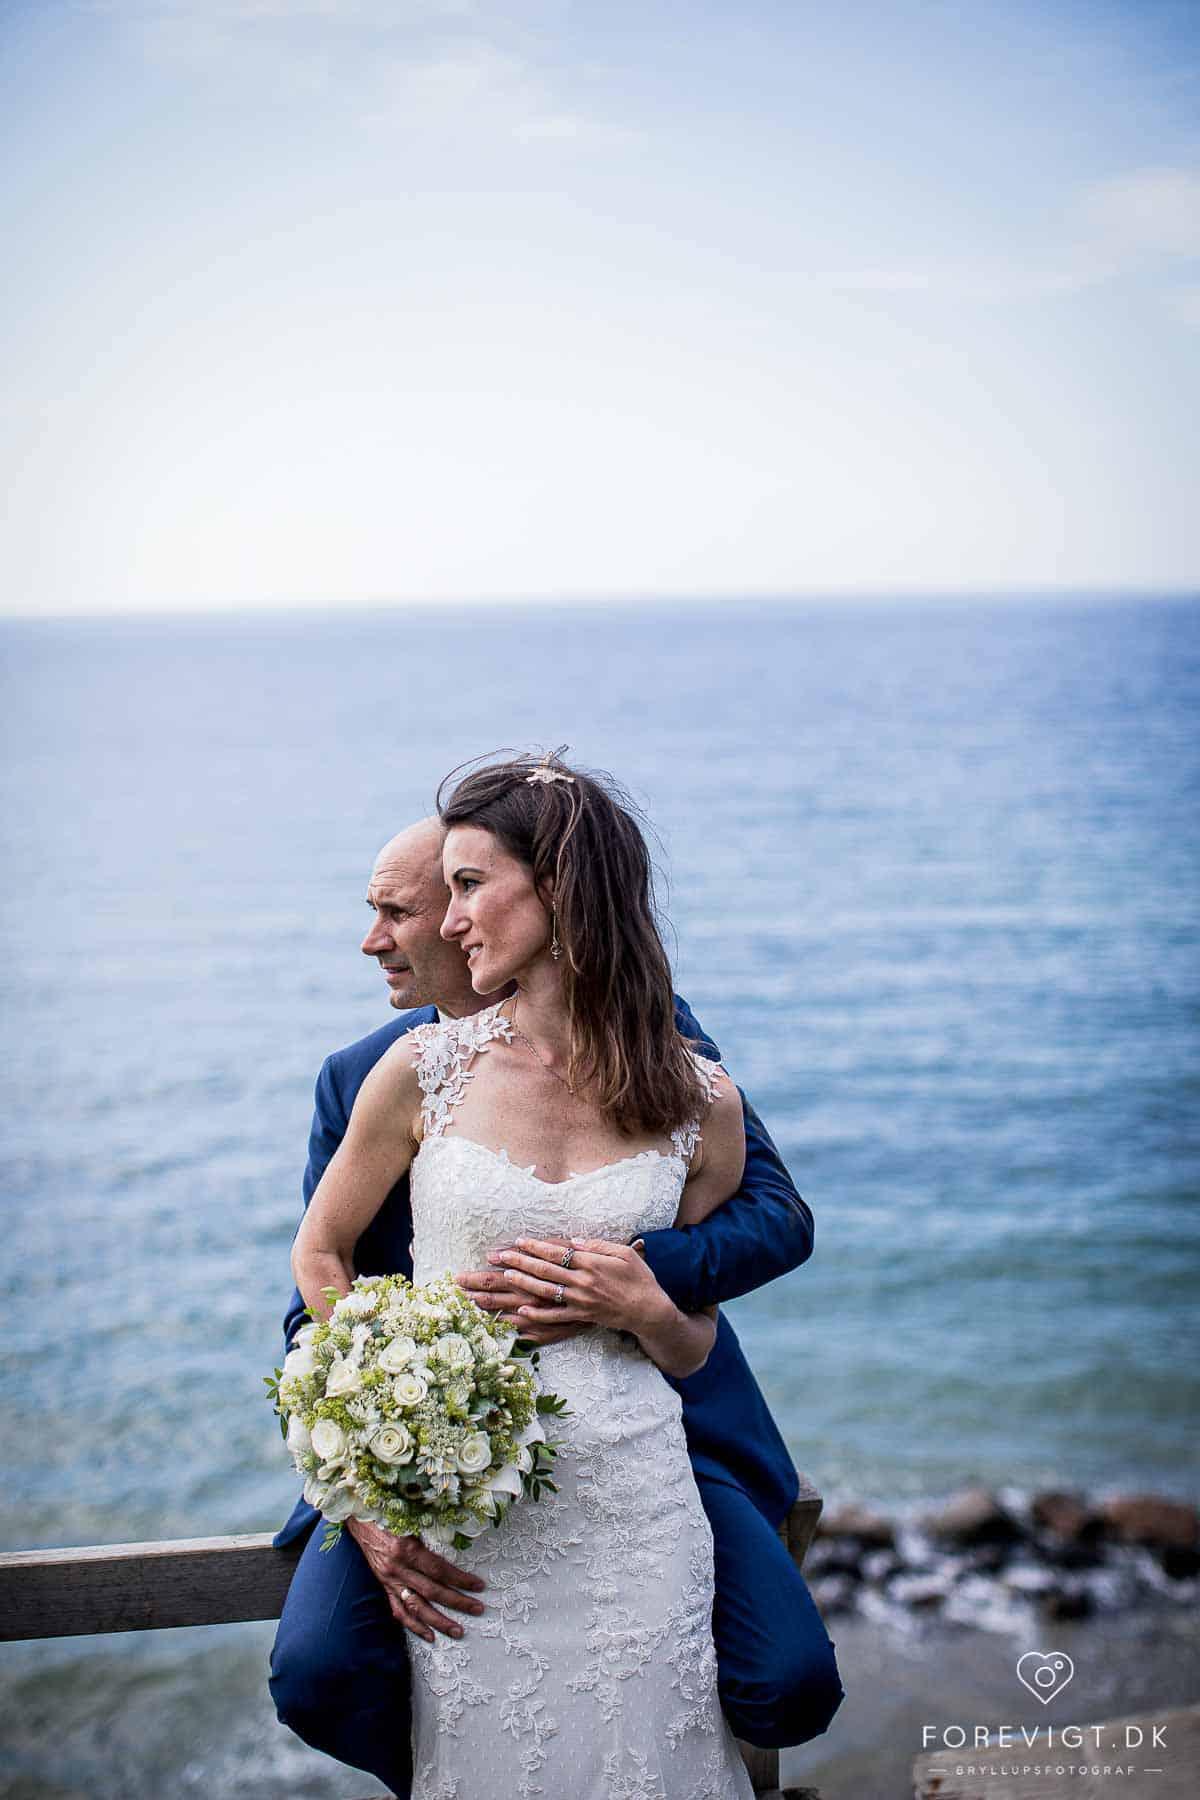 Professionel bryllupsfotograf | Bryllups pakker fra 3500